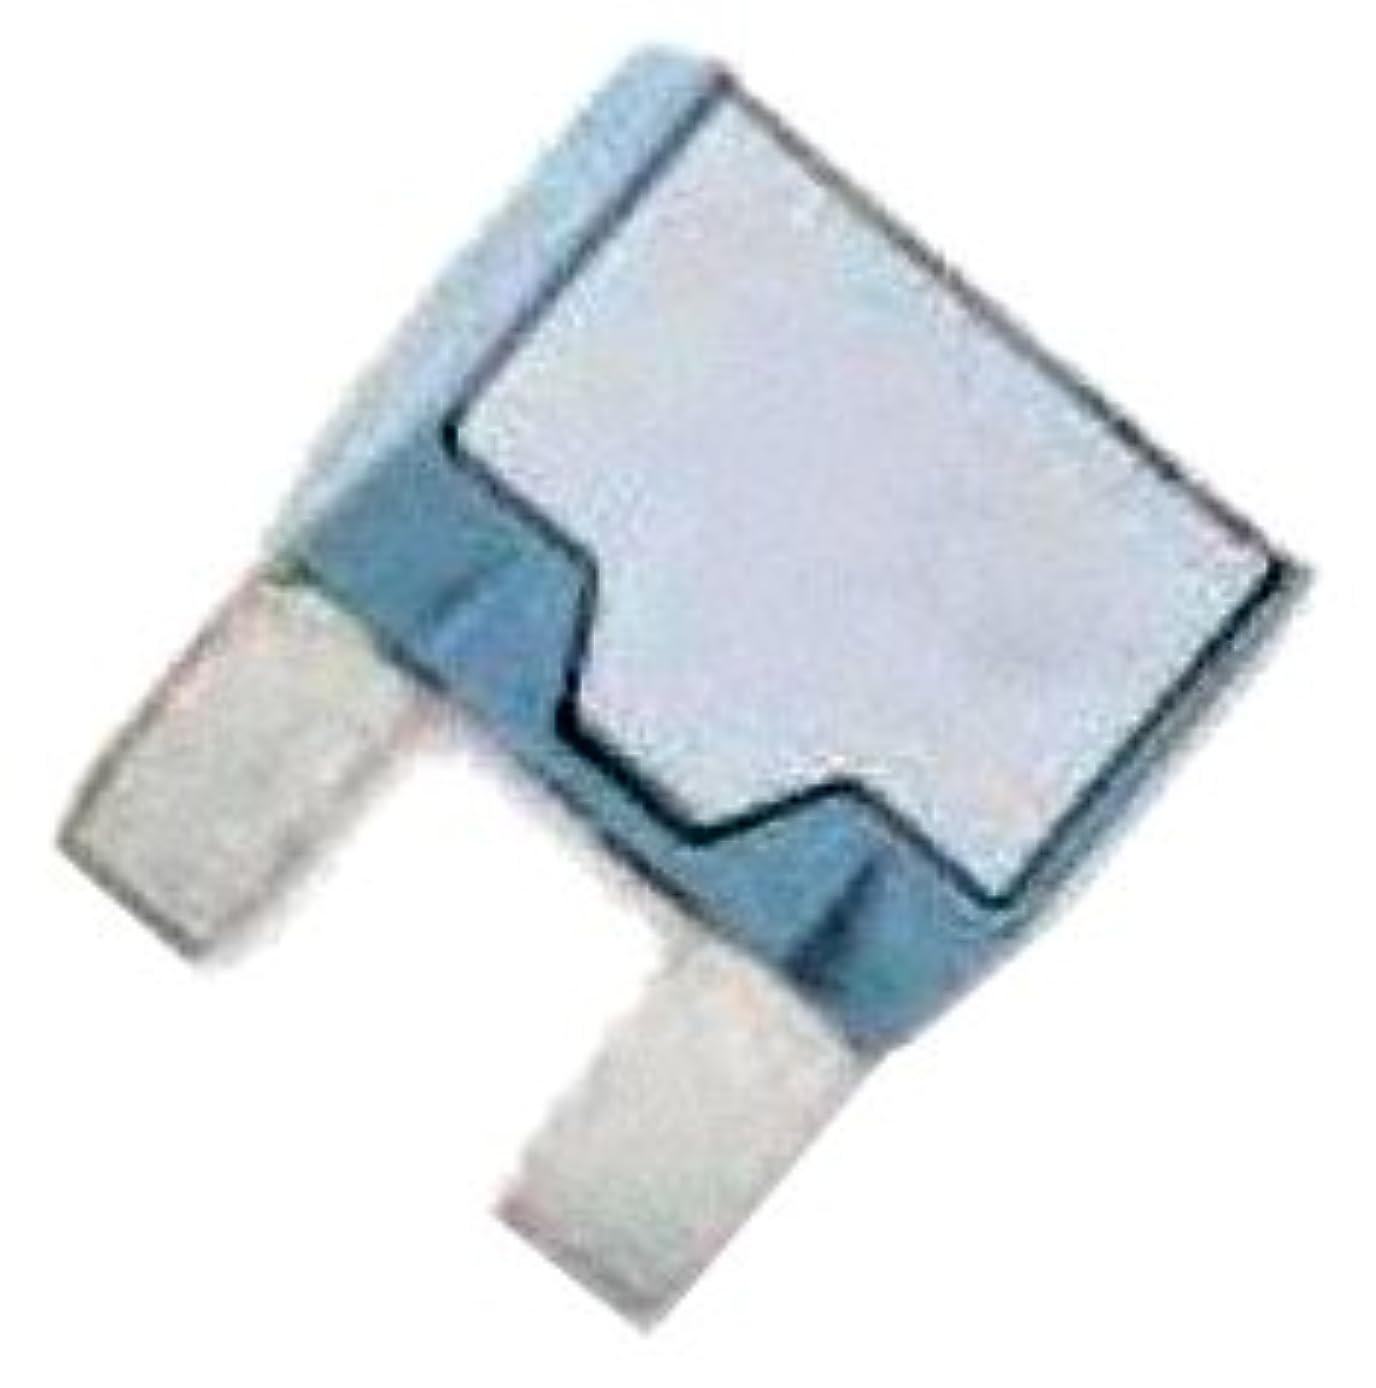 Bussmann CB1911-20 Automotive Accessories